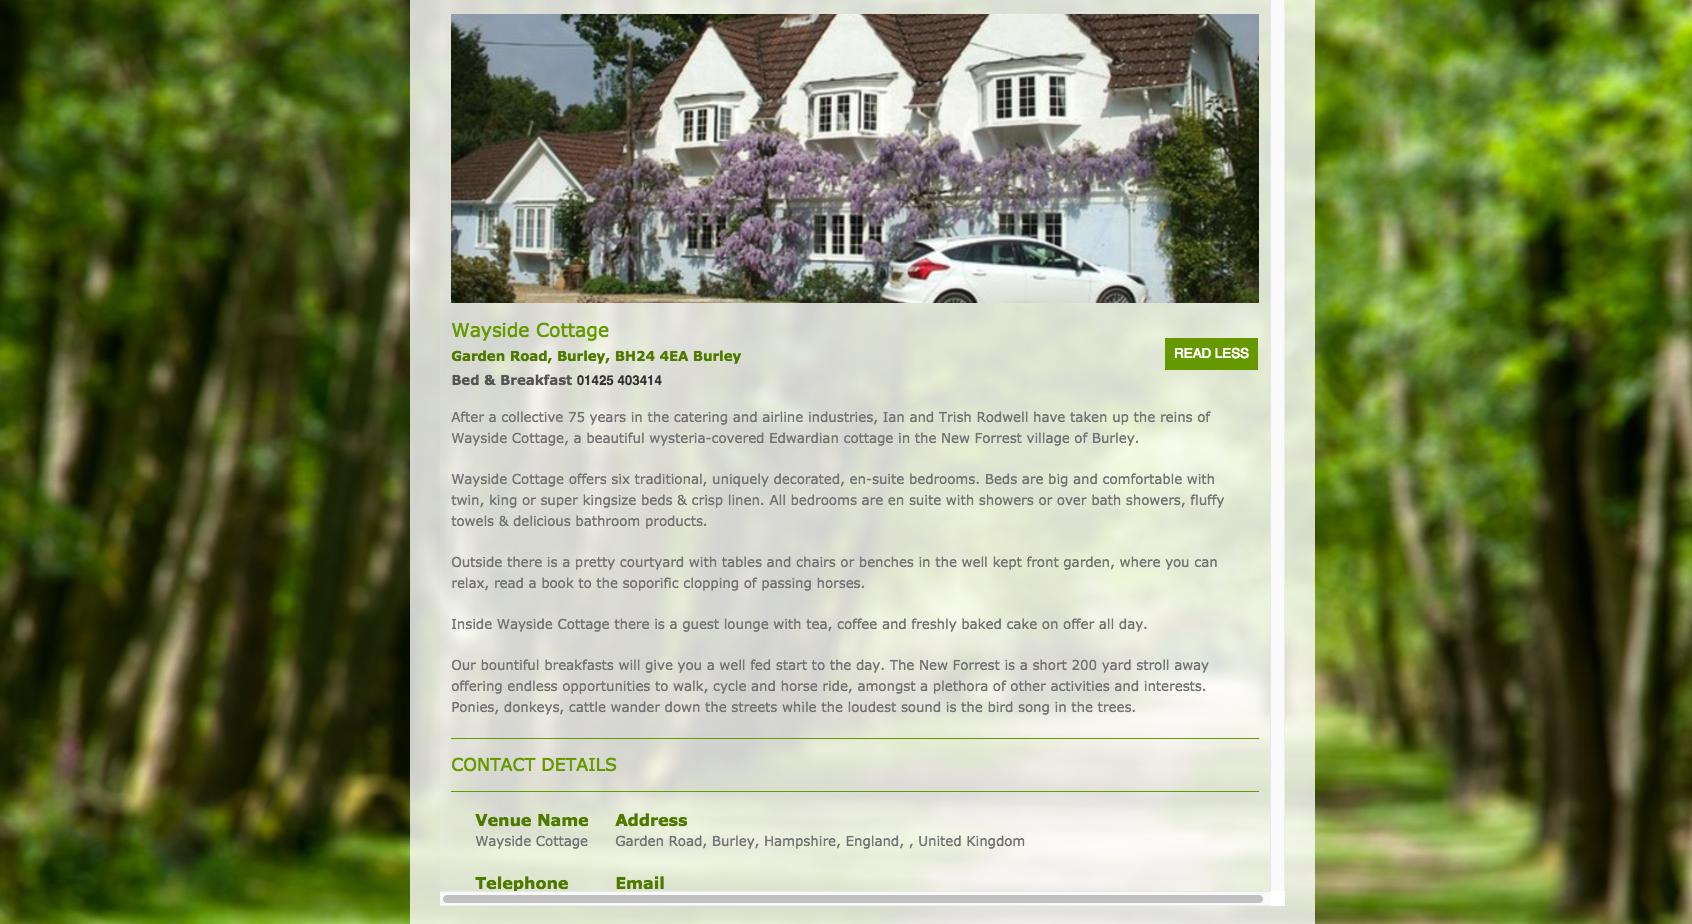 Wayside Cottage Burley